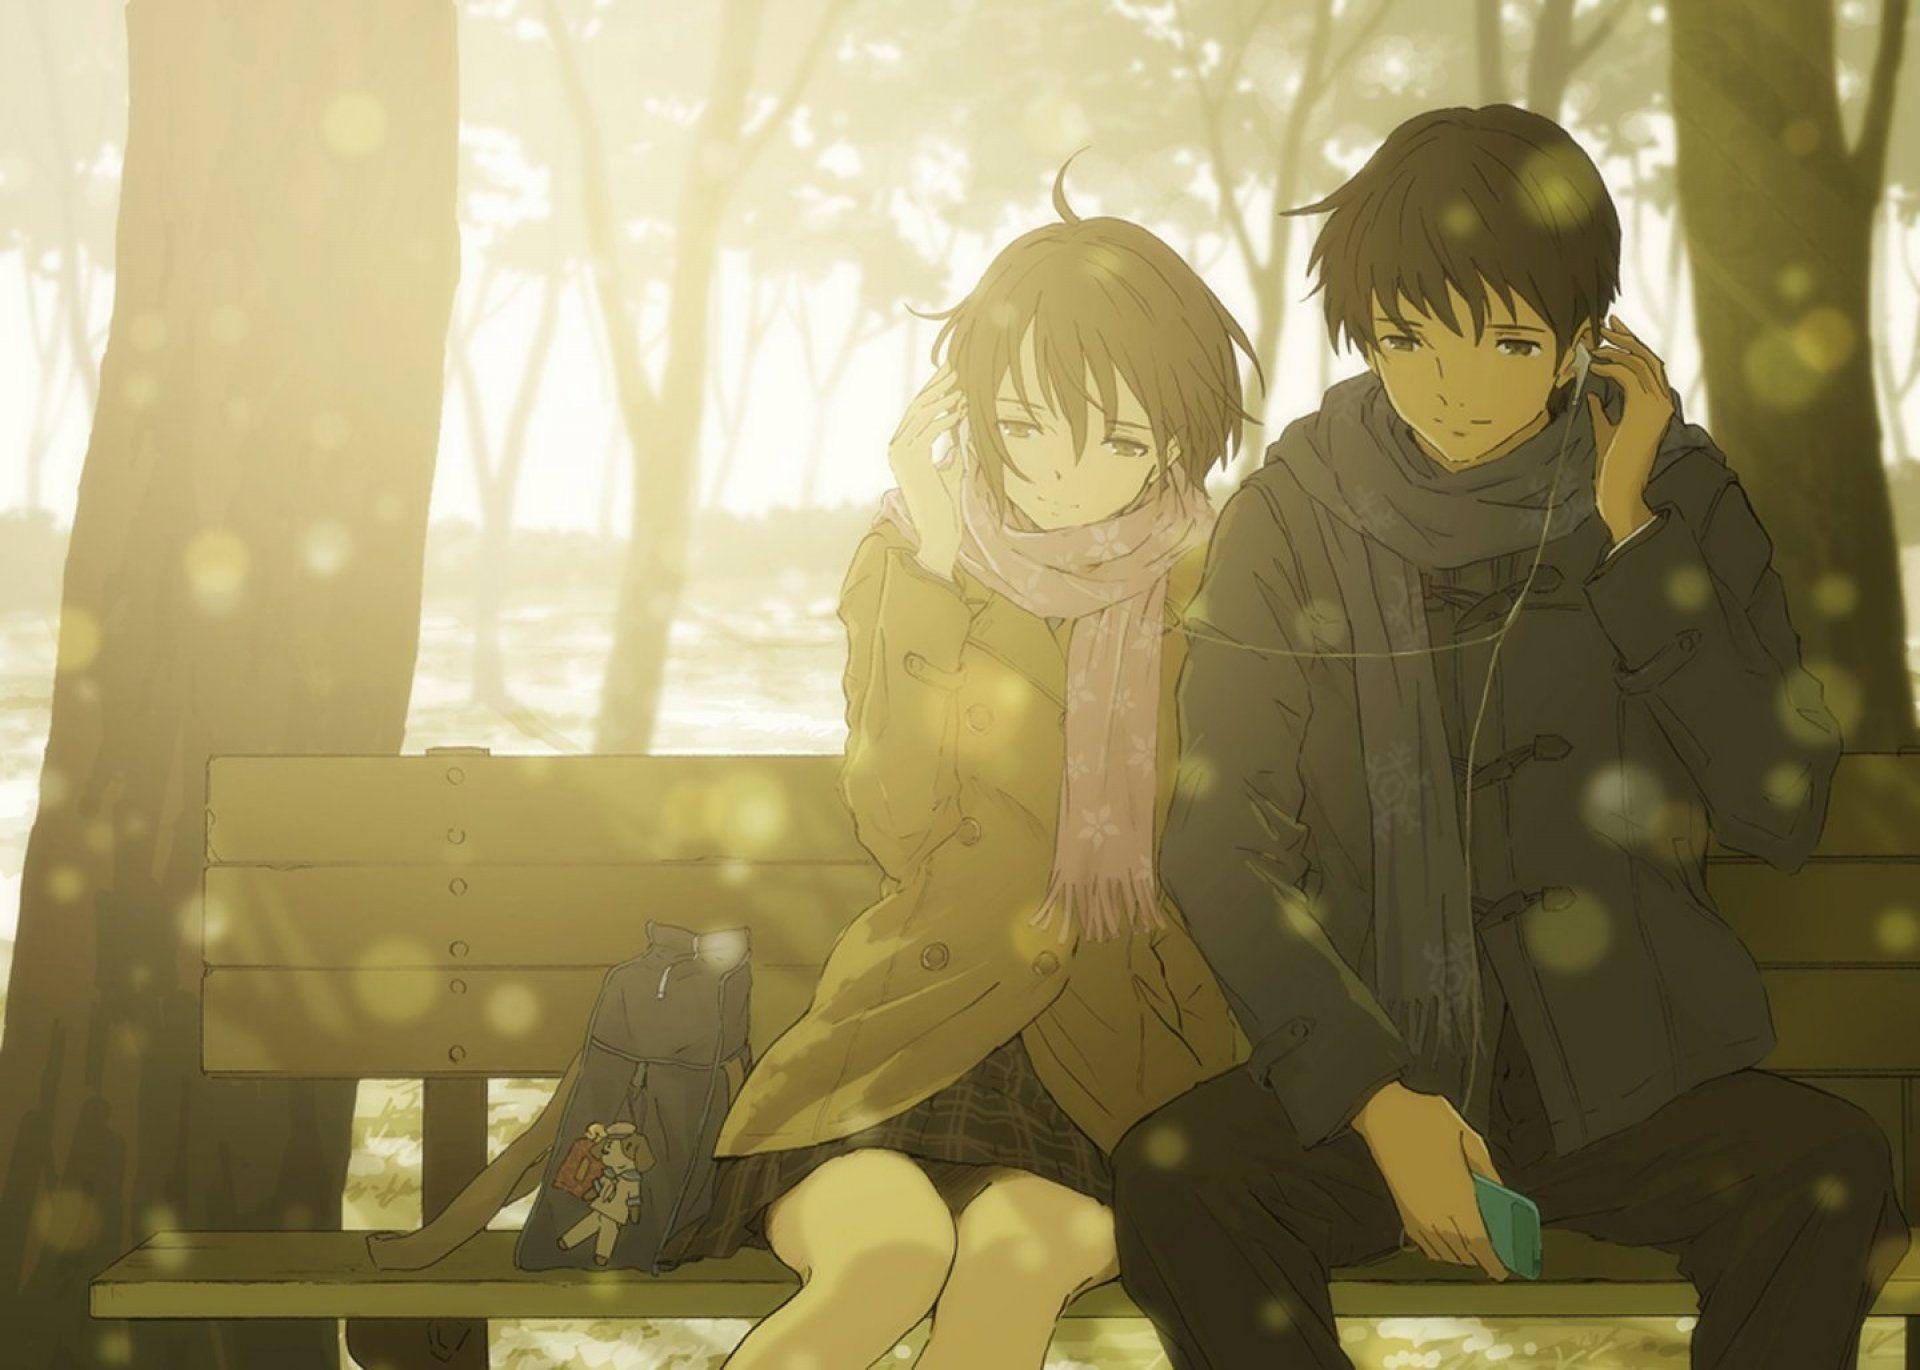 Anime Love Couple Music Headphone Tree Winter Sunshine Romantic 1920x1370 Romantic Anime Anime Wallpaper Anime Love Couple